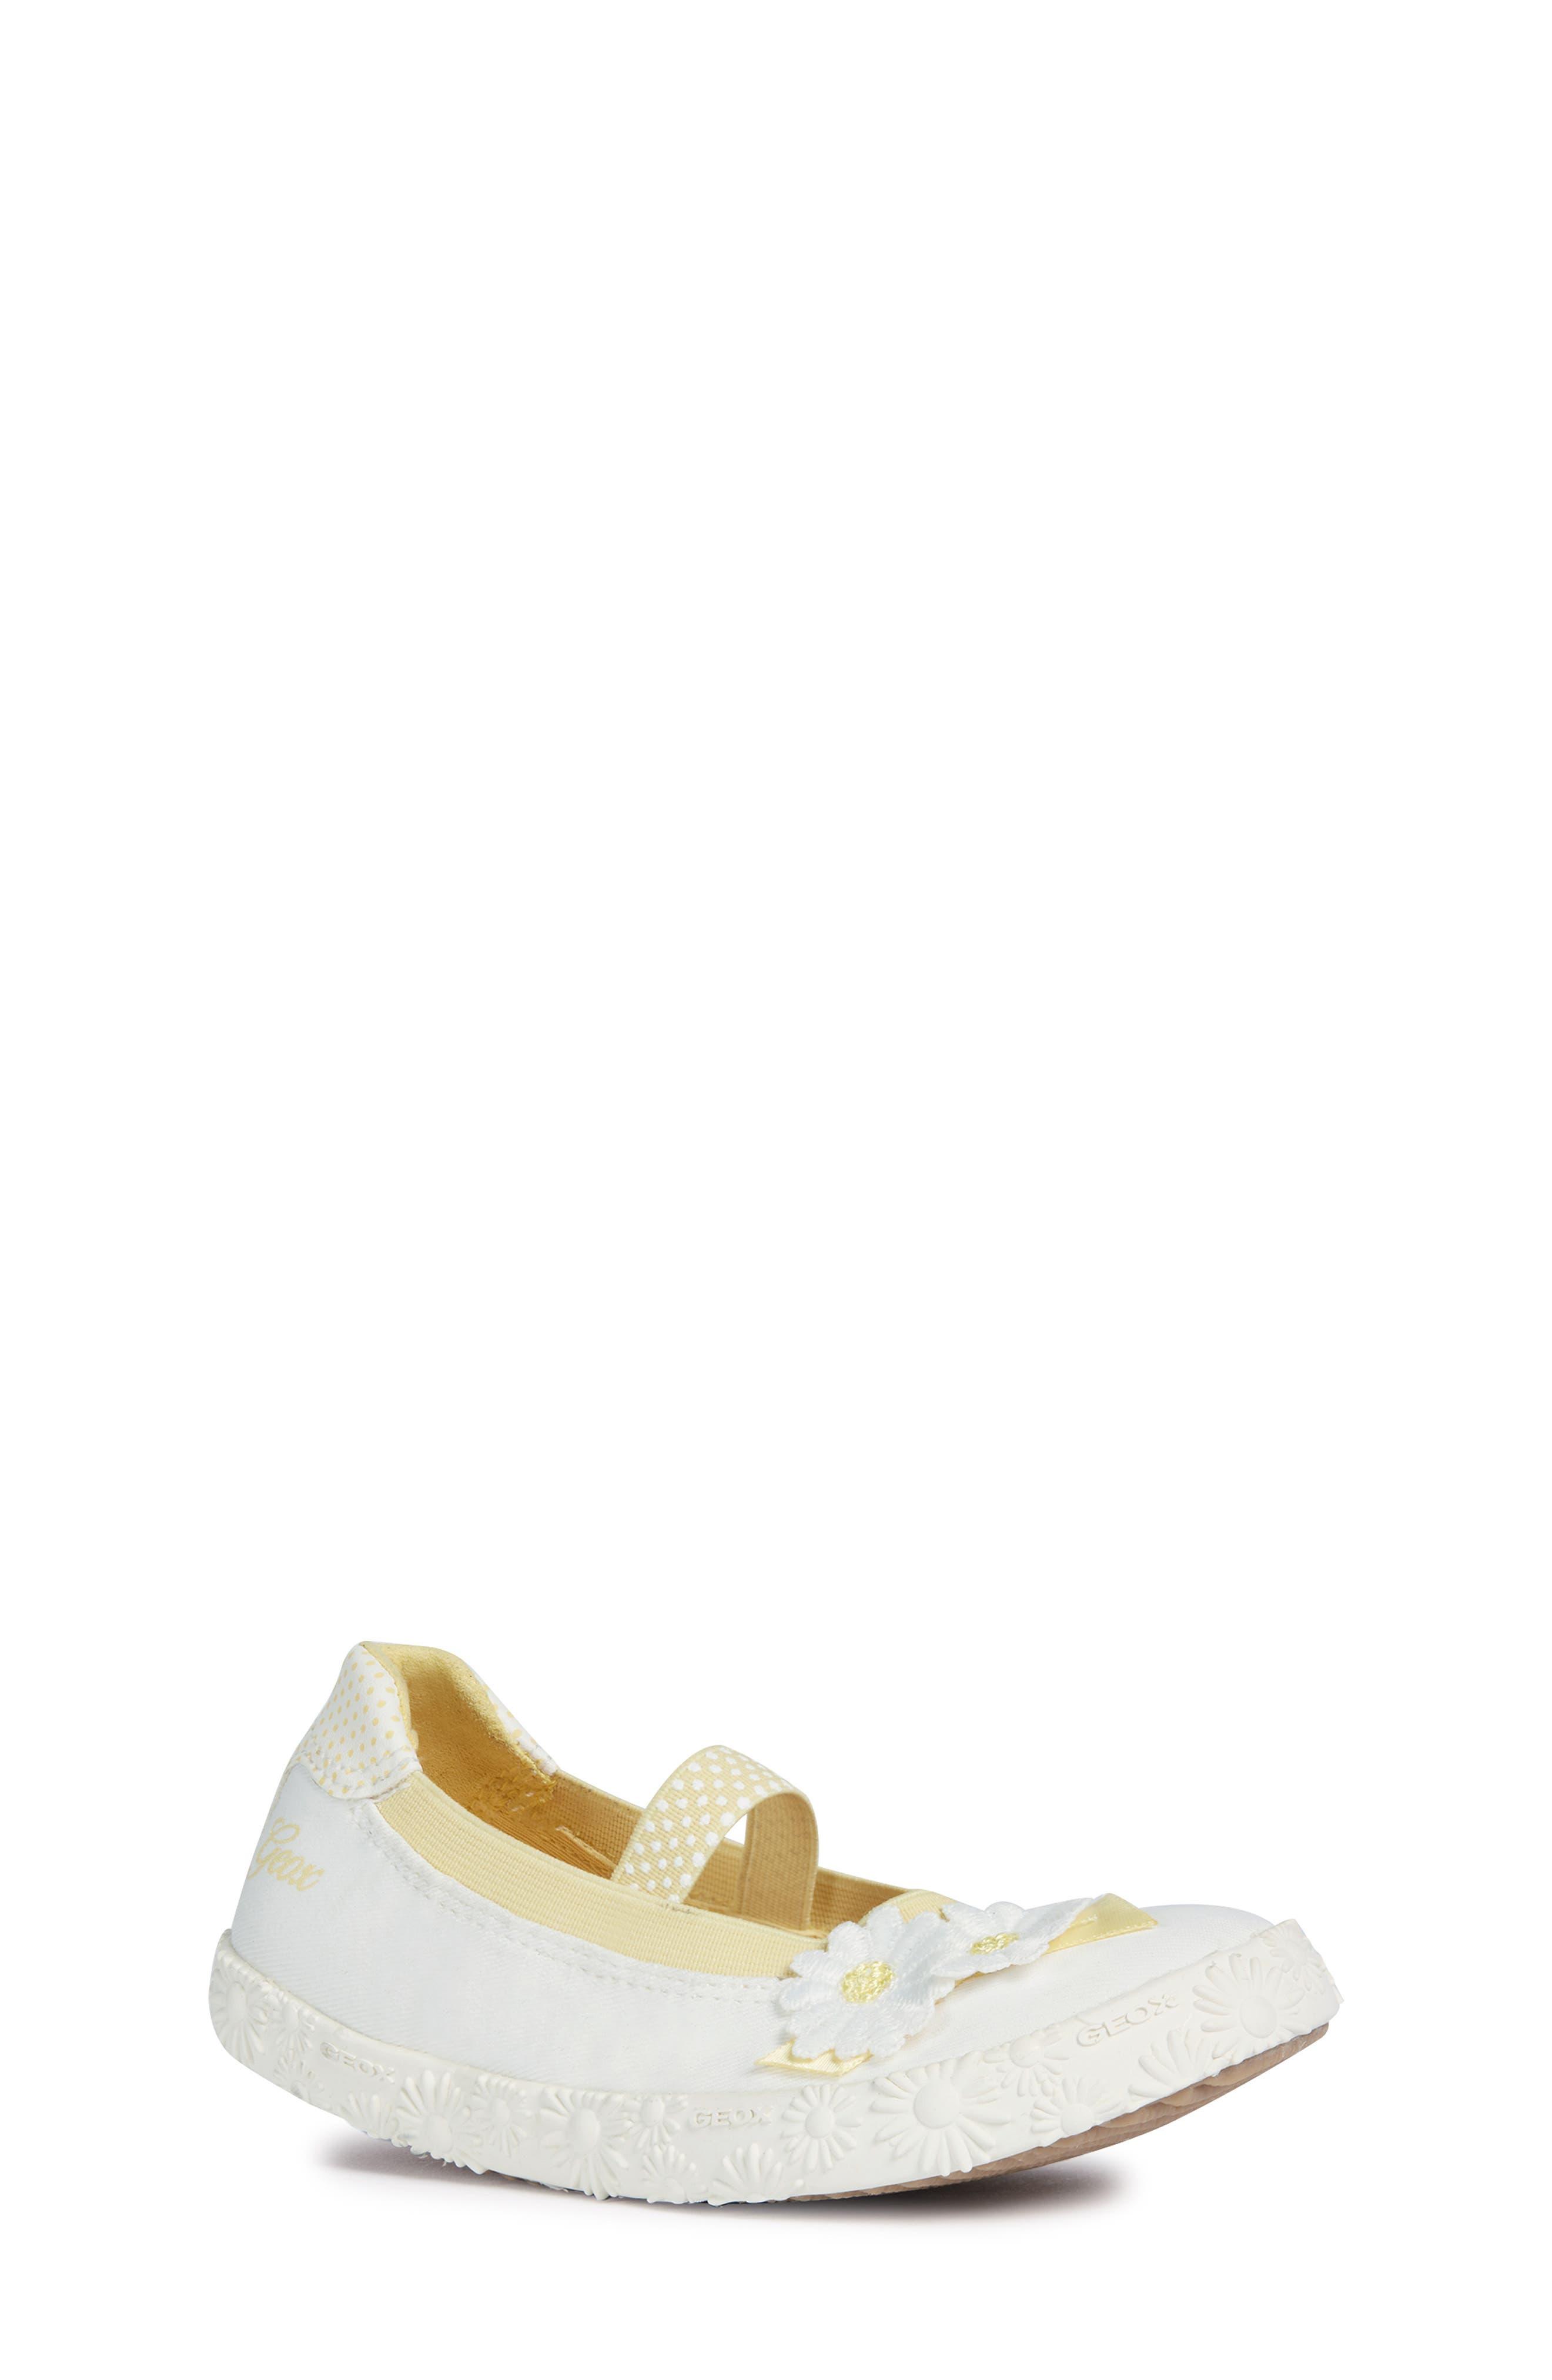 GEOX, Kilwi Daisy Mary Jane Sneaker, Main thumbnail 1, color, WHITE